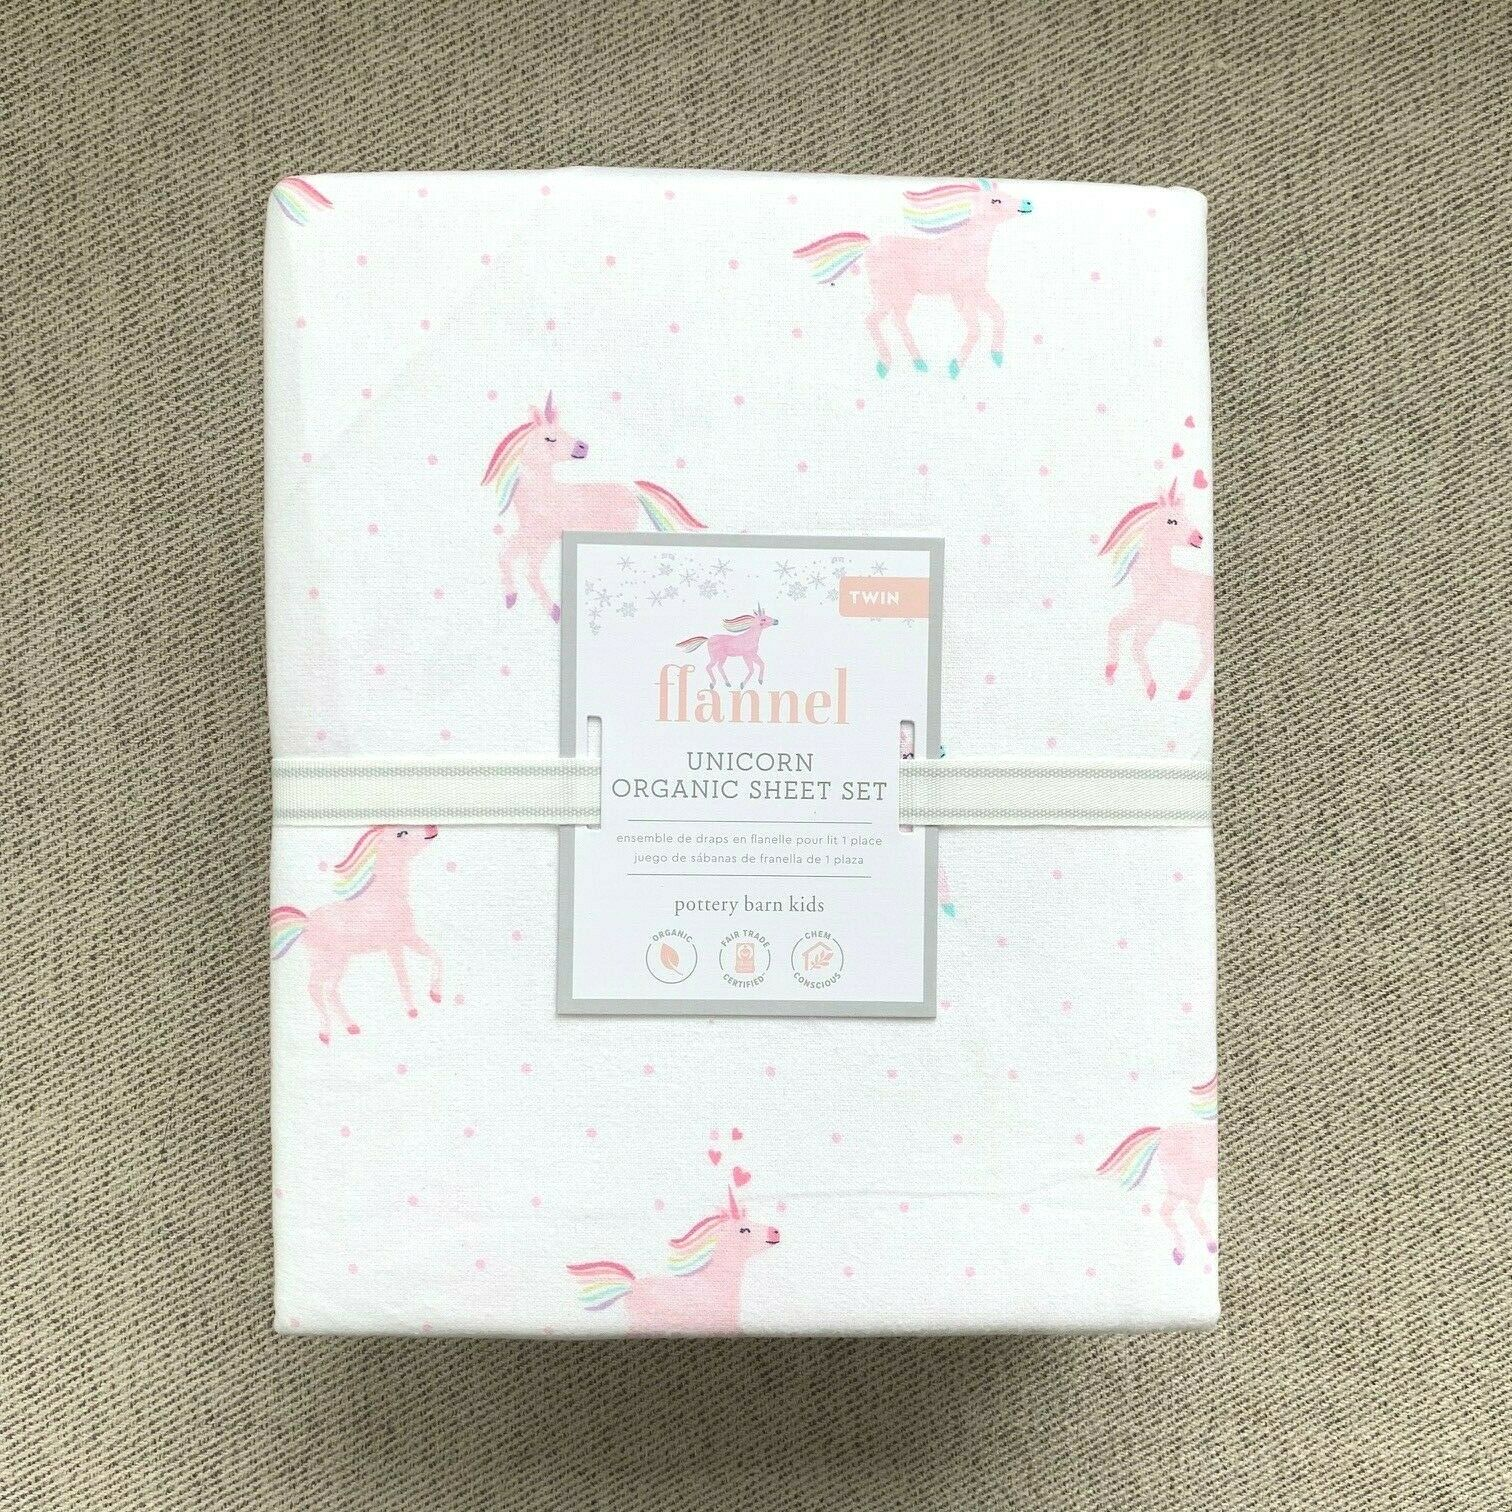 Pottery Barn Kids Organic Flannel Rainbow Unicorn Twin Sheet Set Pink Horse For Sale Online Ebay